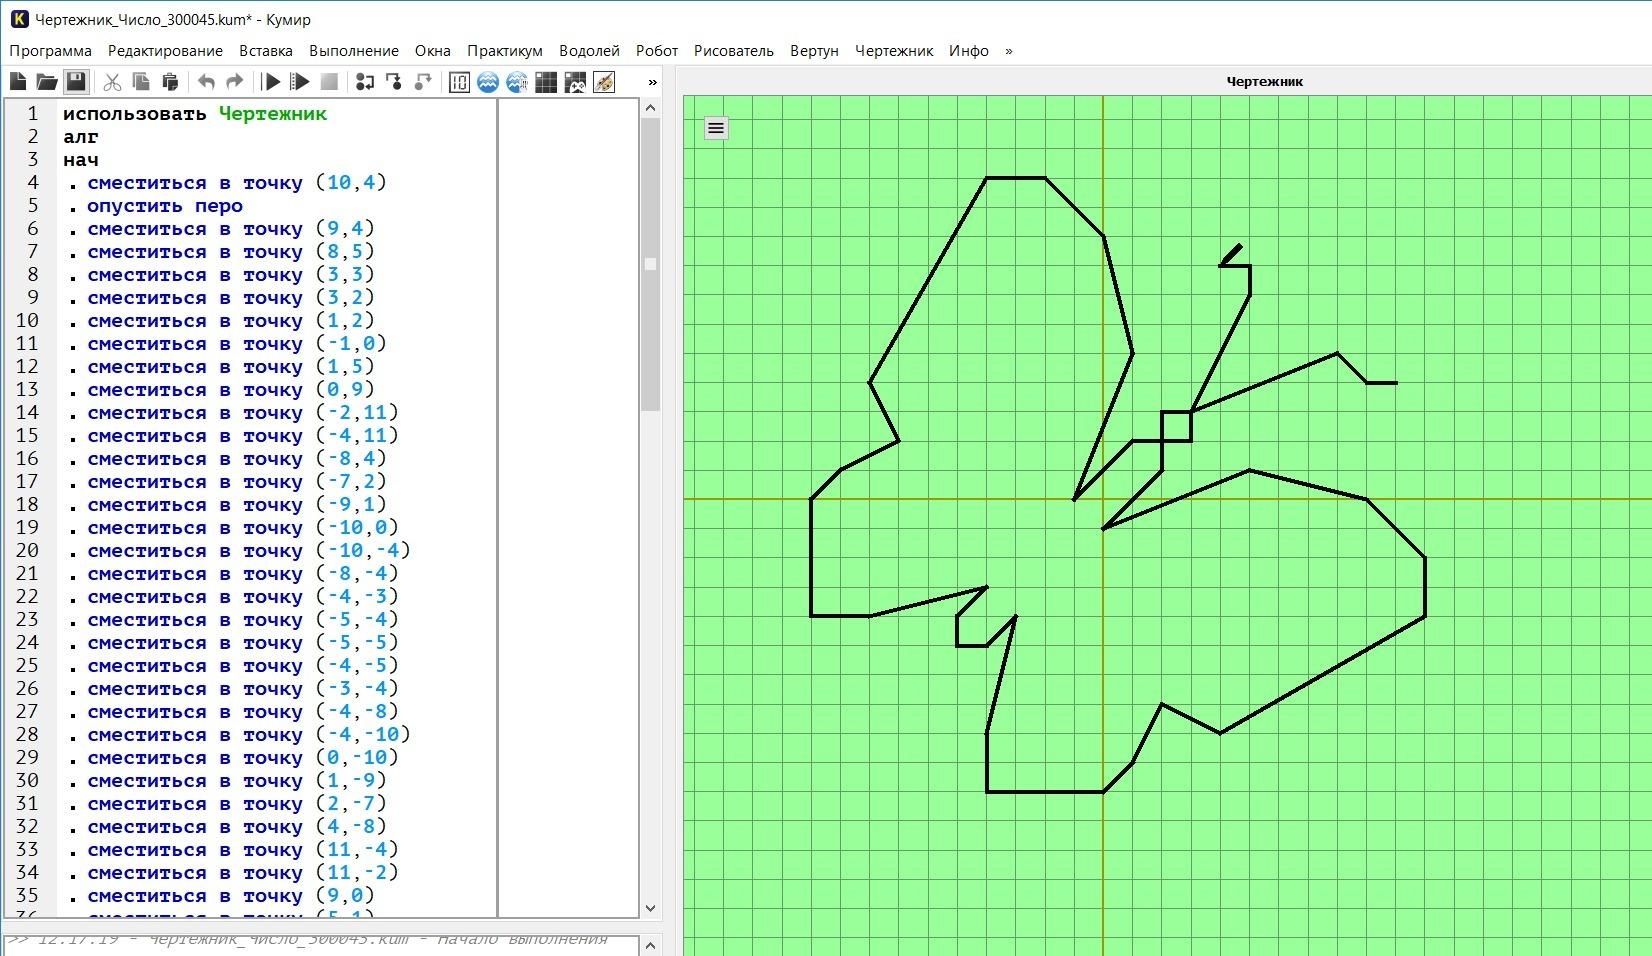 картинки для чертежника кумир с координатами благодати